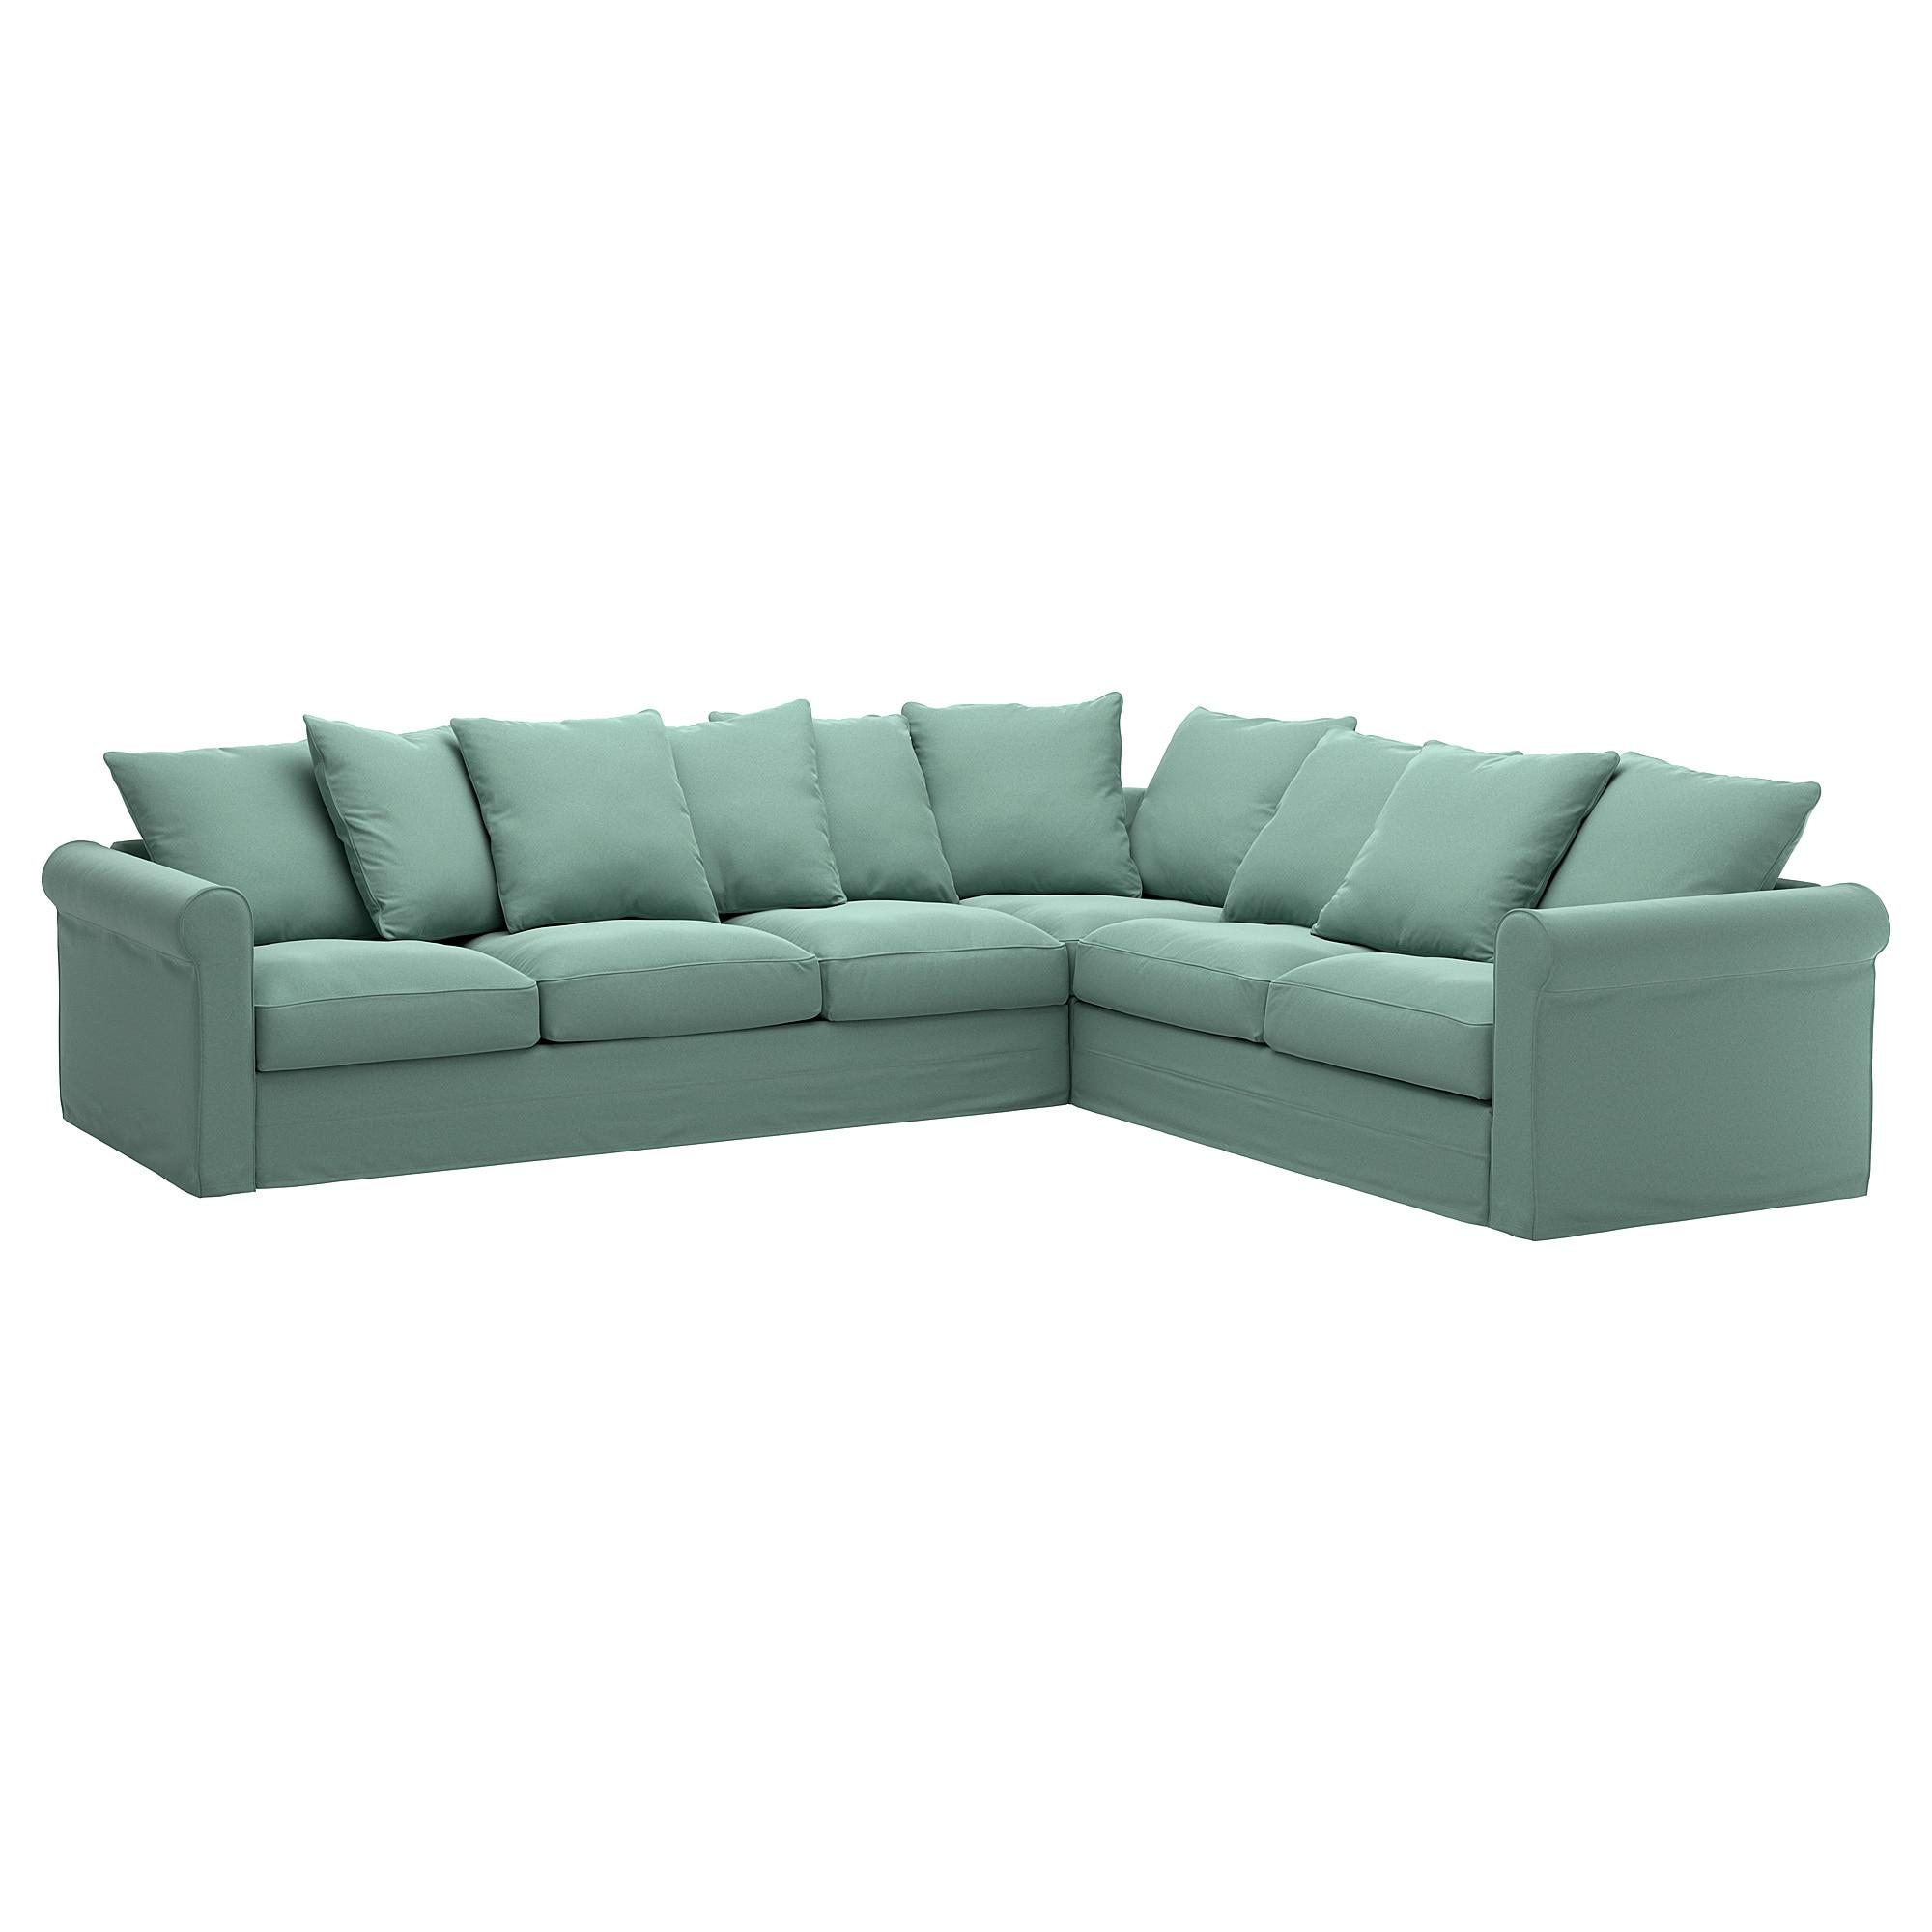 Sofa 5 Plazas Zwd9 Grà Nlid sofà 5 Plazas Esquina Ljungen Verde Claro Ikea